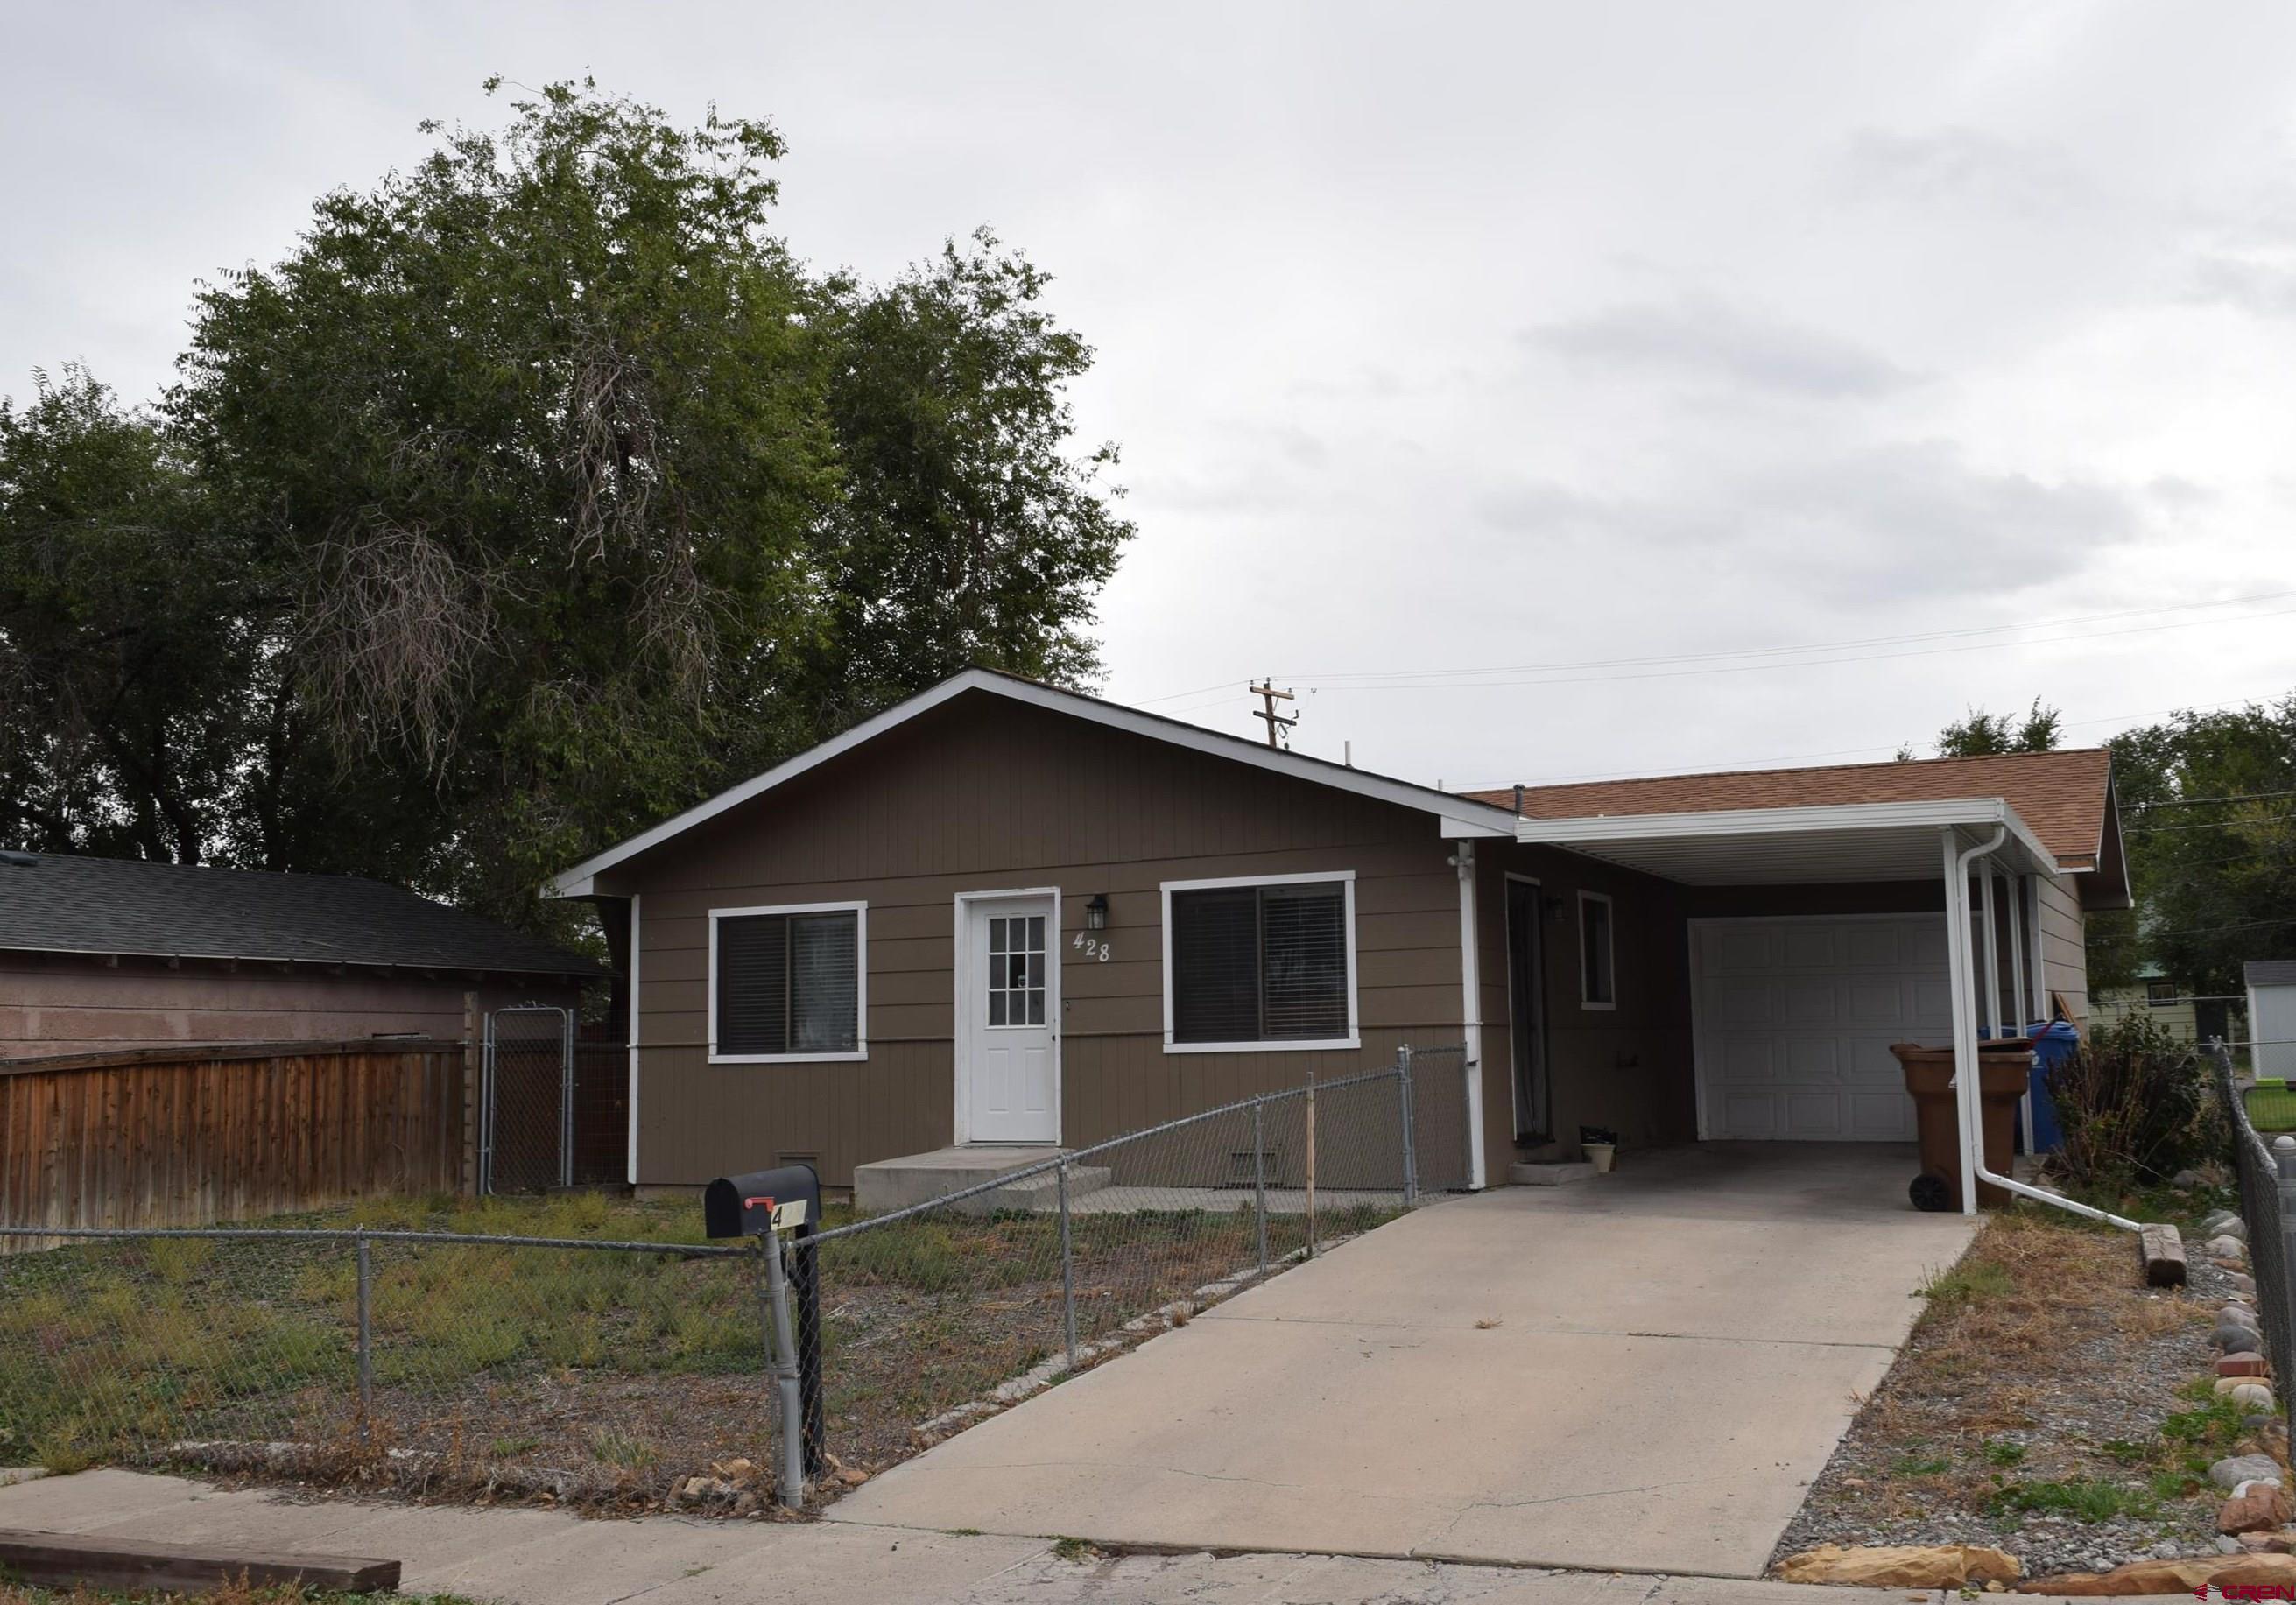 428 N 7th Street, Montrose, CO 81401